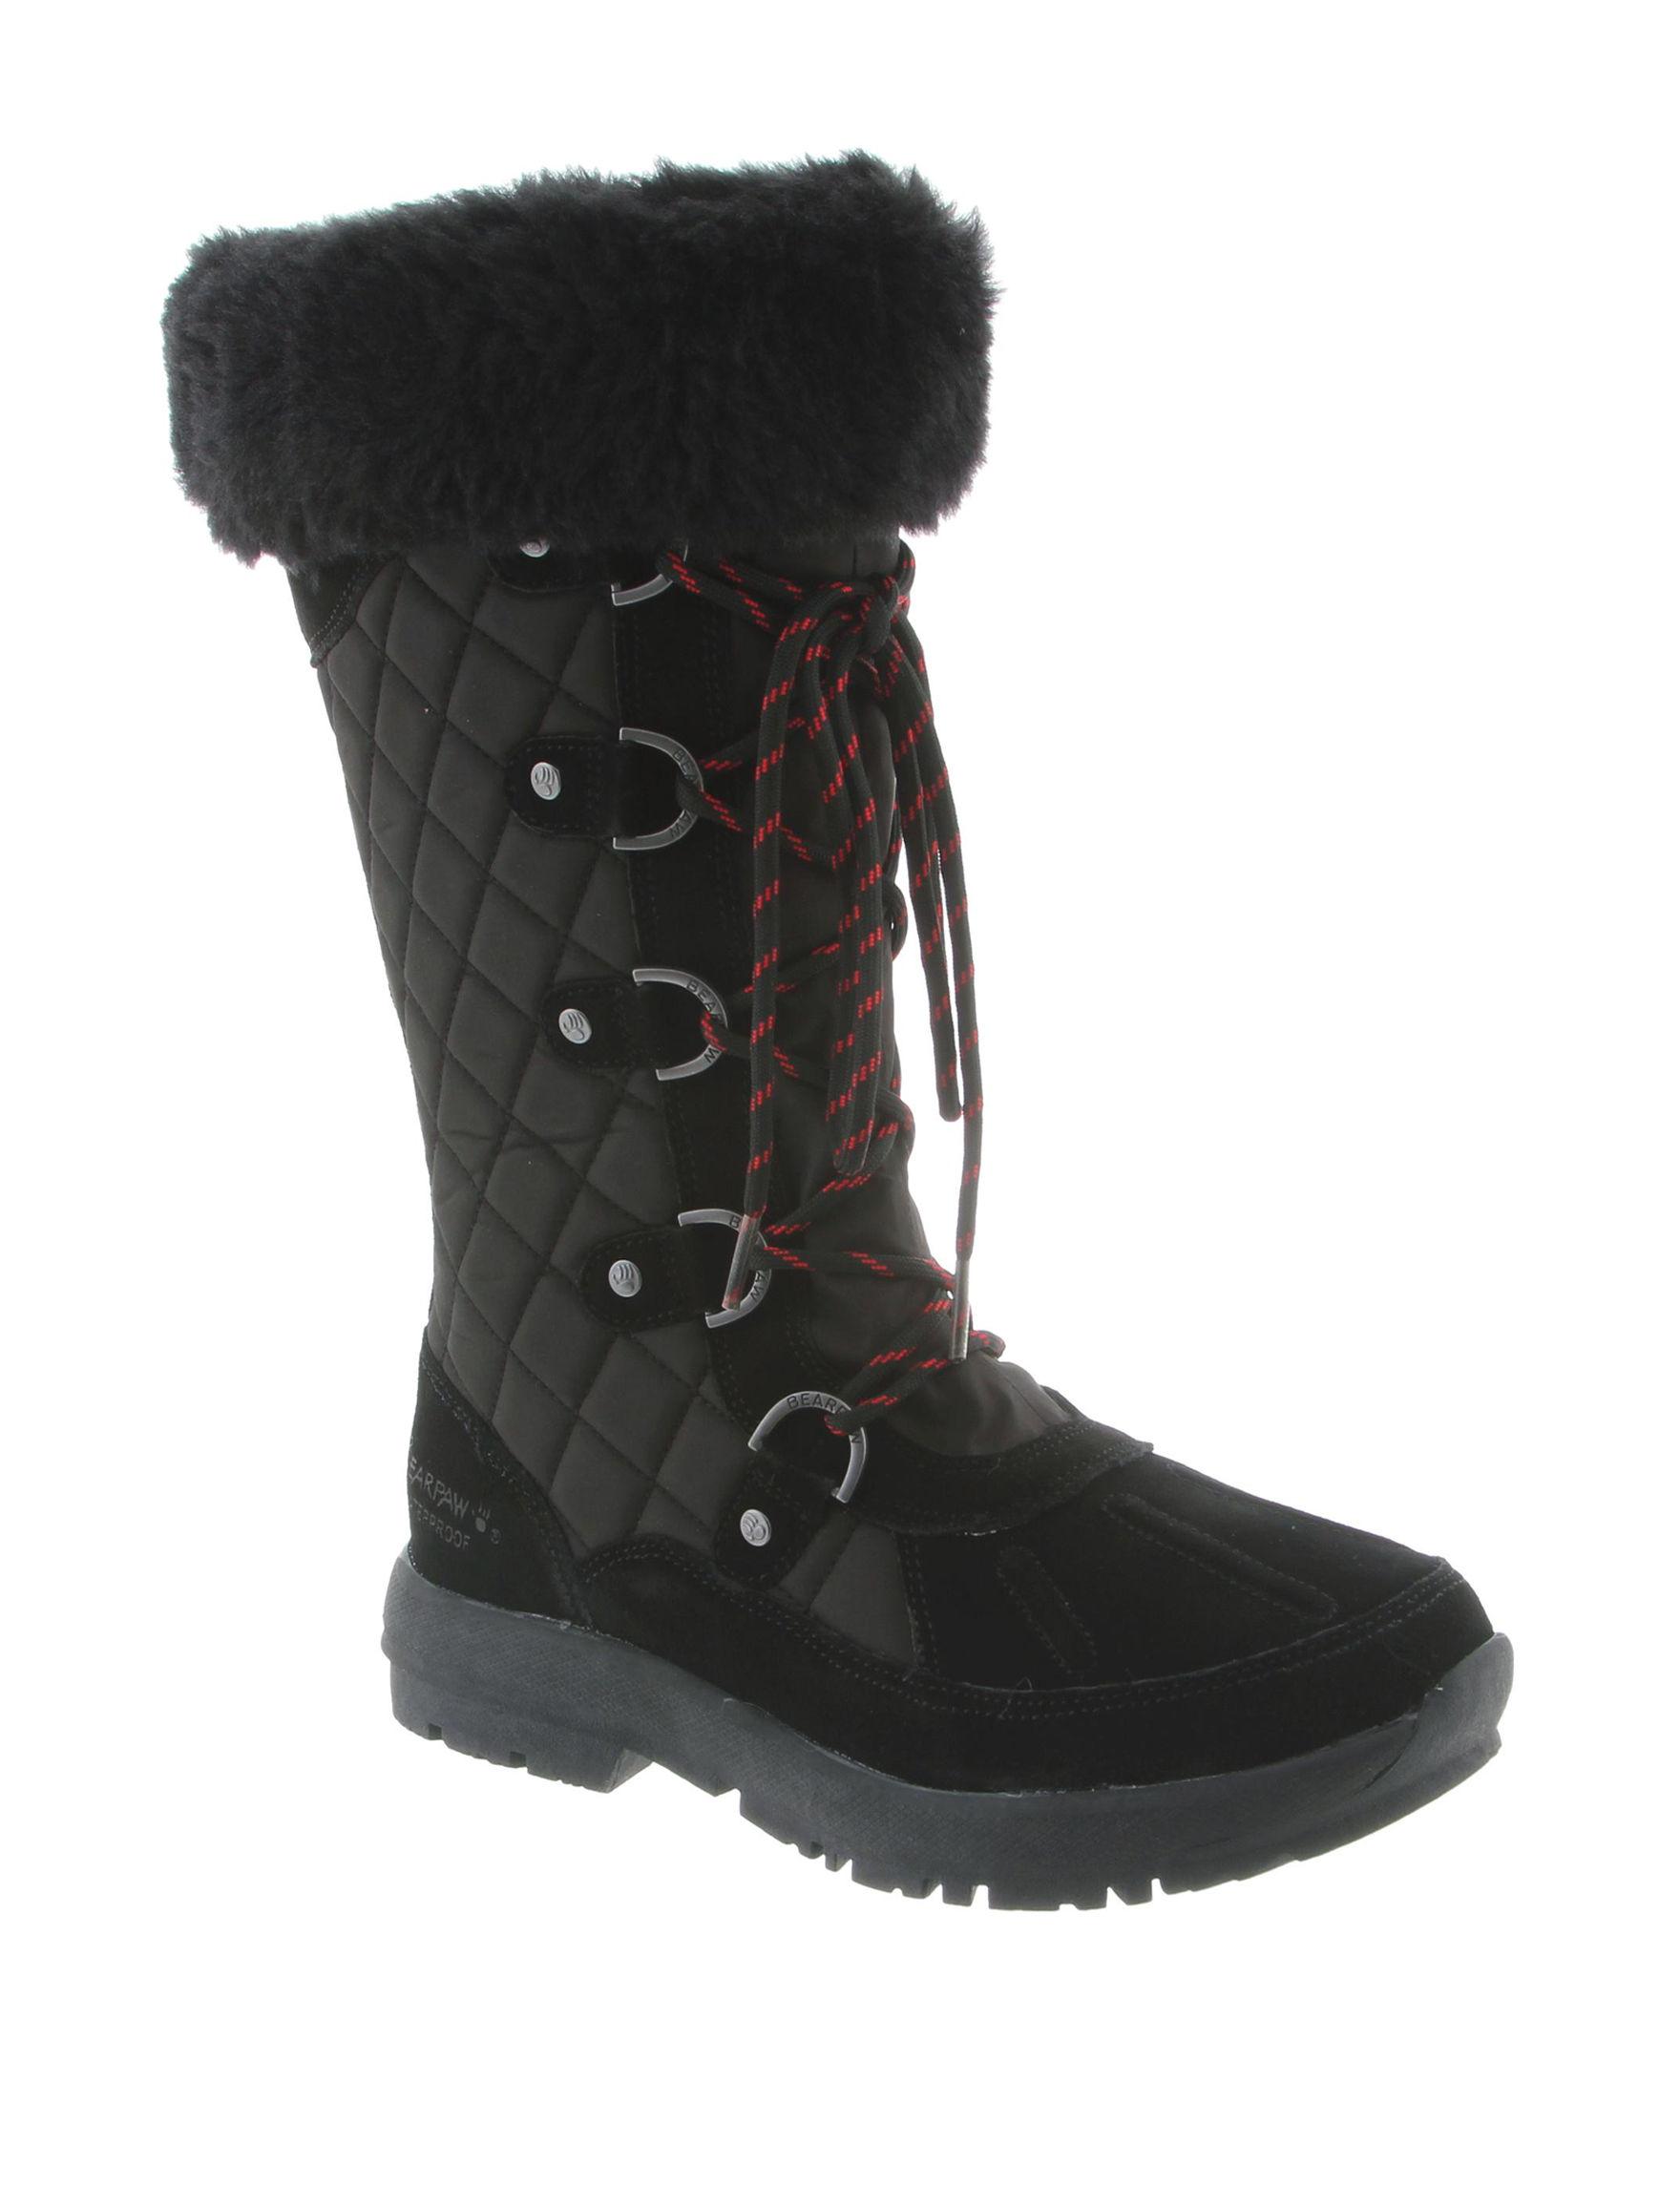 Bearpaw Black Winter Boots